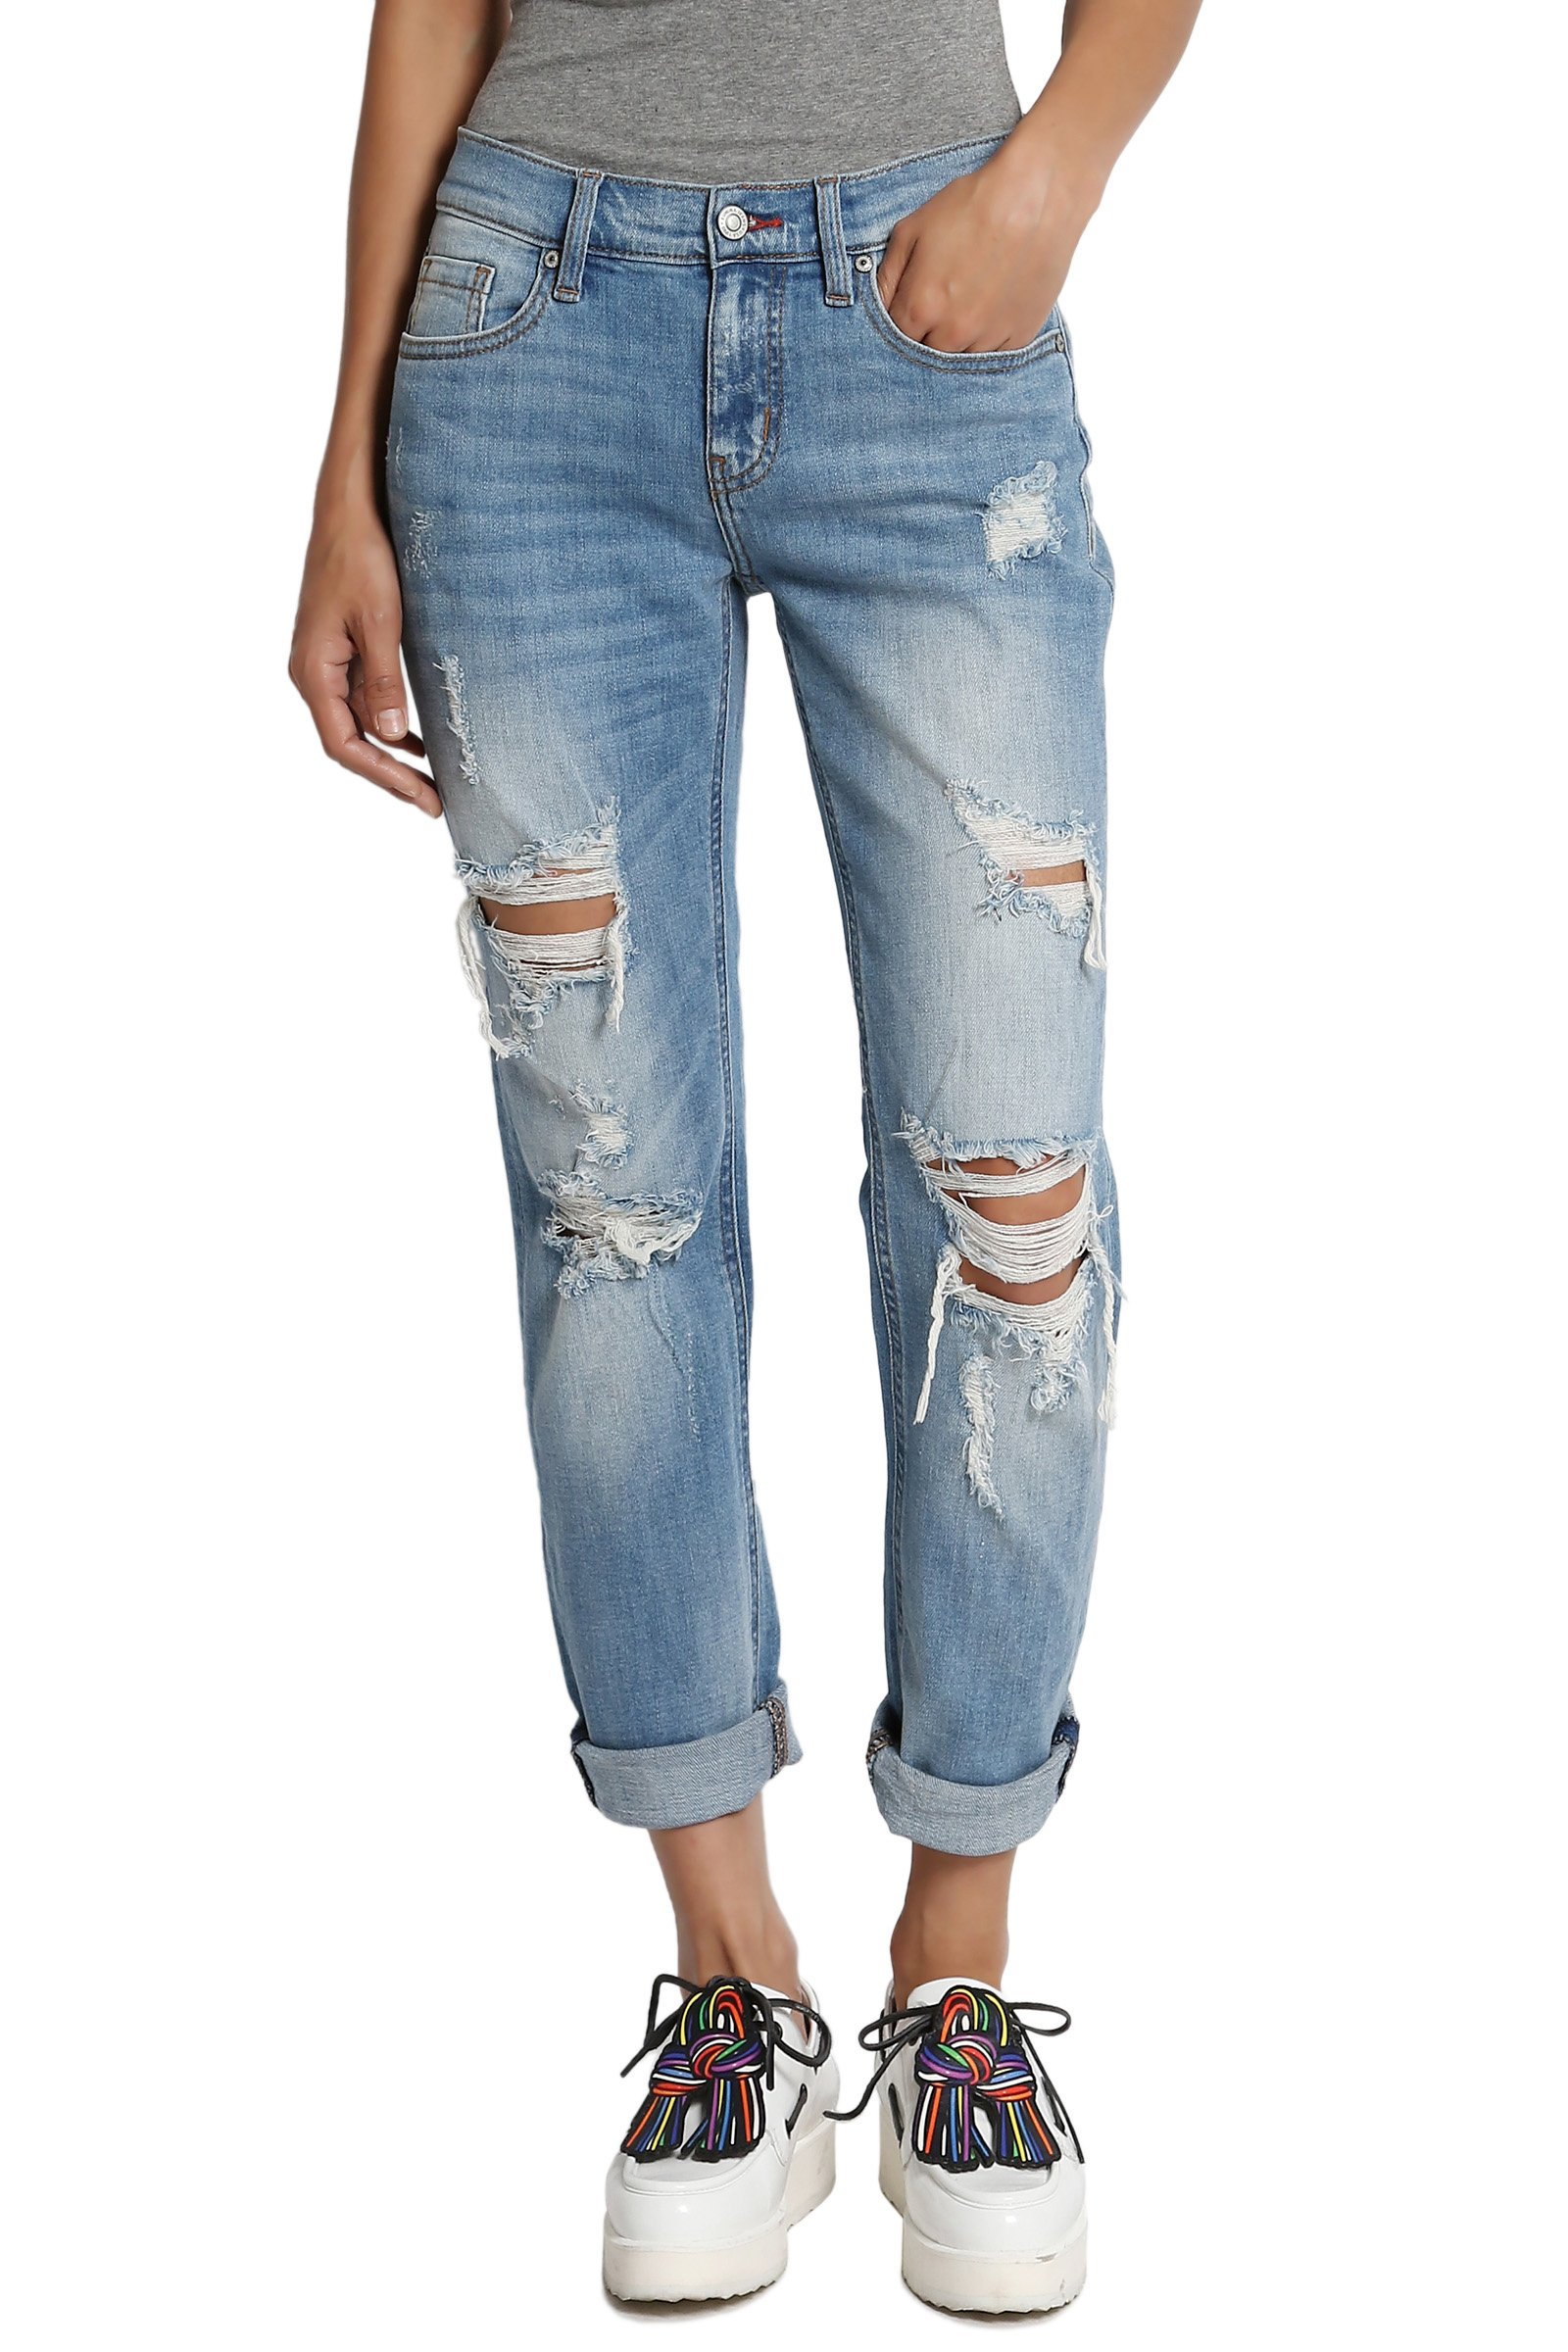 TheMogan Women's Distressed Washed Denim Mid Rise Boyfriend Jeans Medium 13